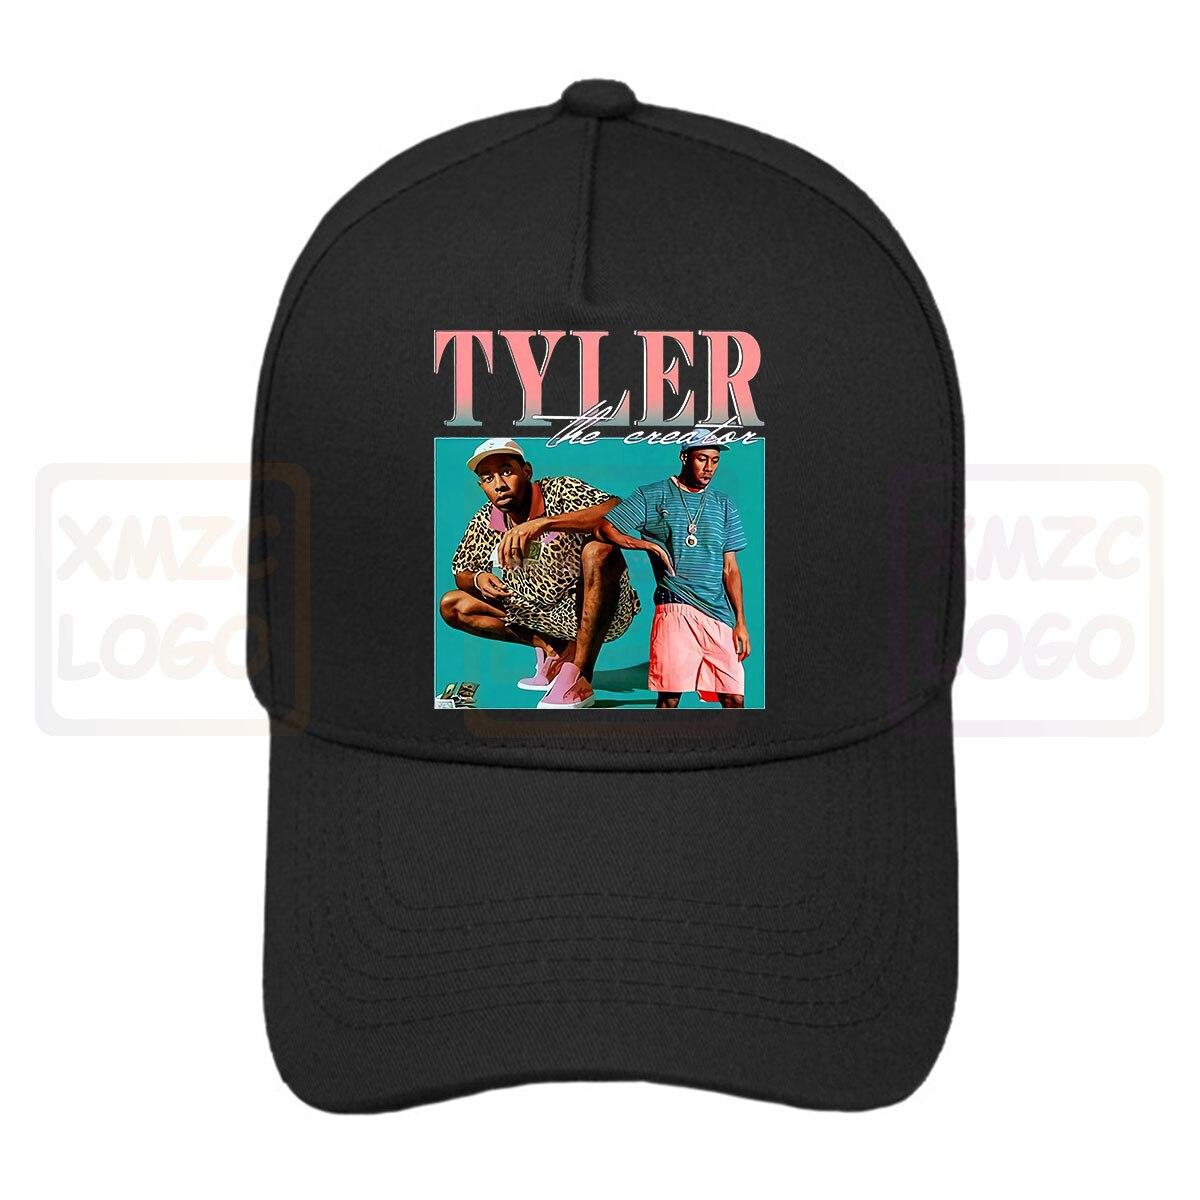 Tyler The Creator Vintage Style Golf Reprint Baseball Cap